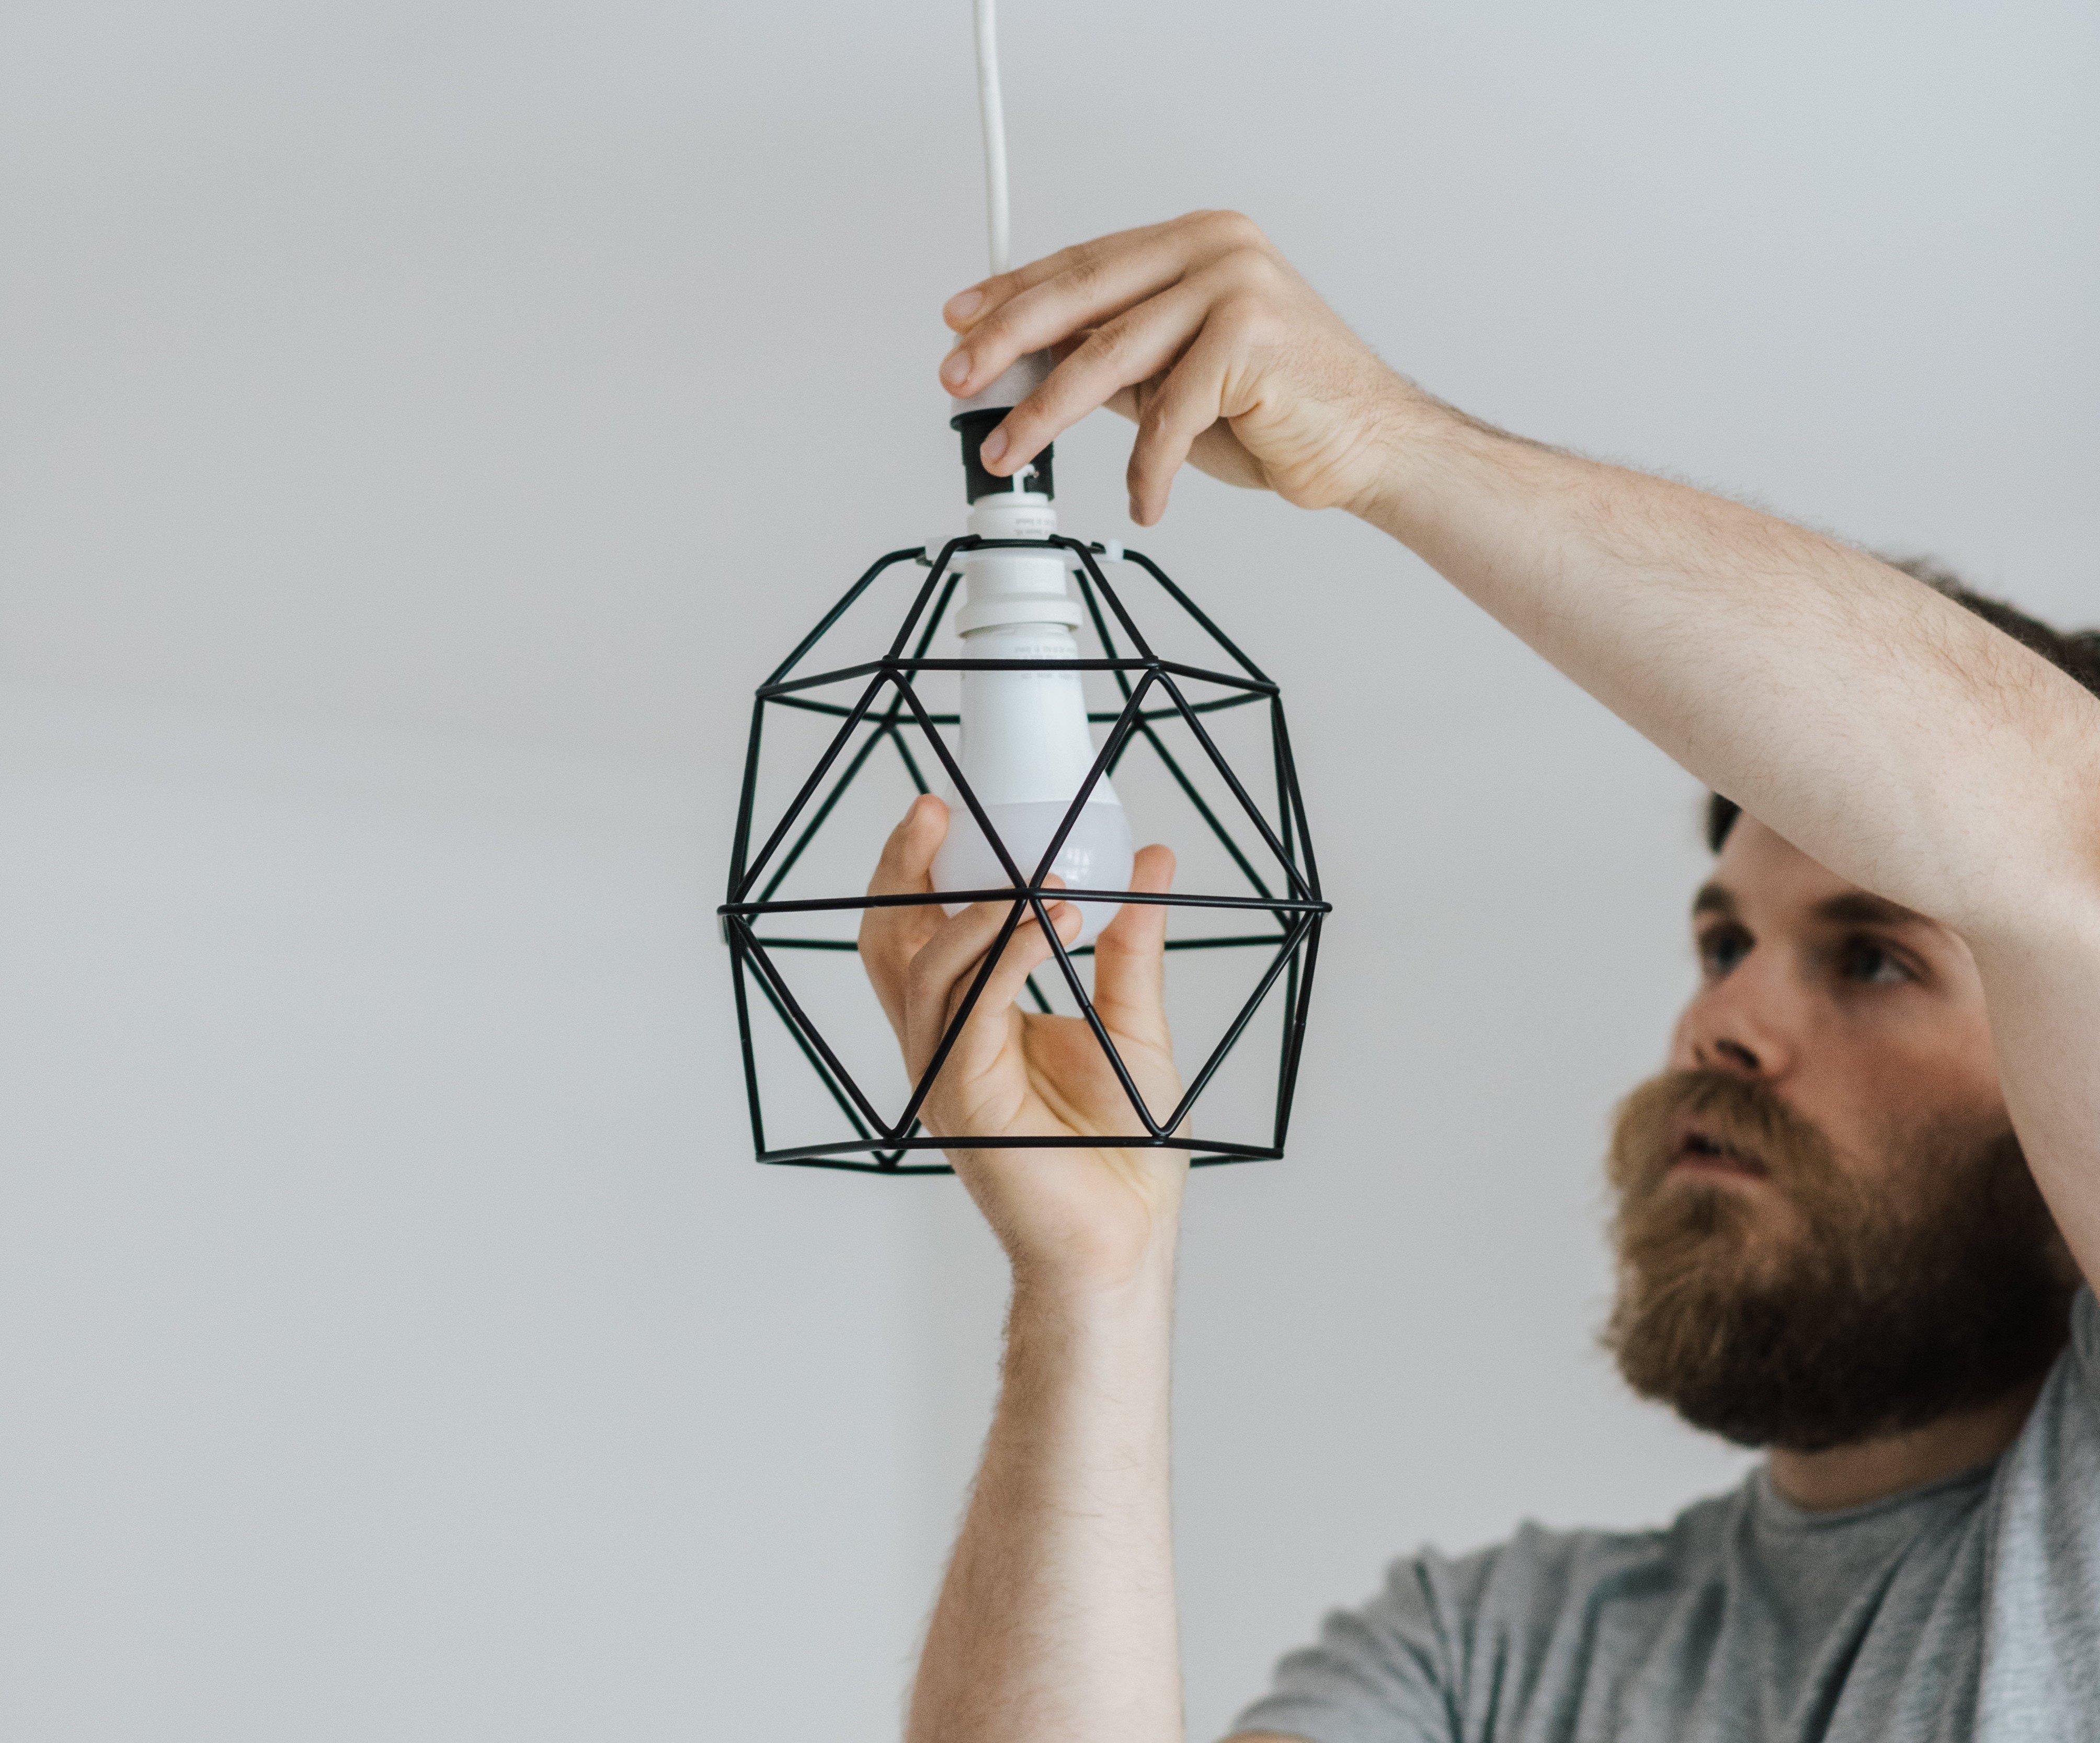 Replacing a Light Bulb